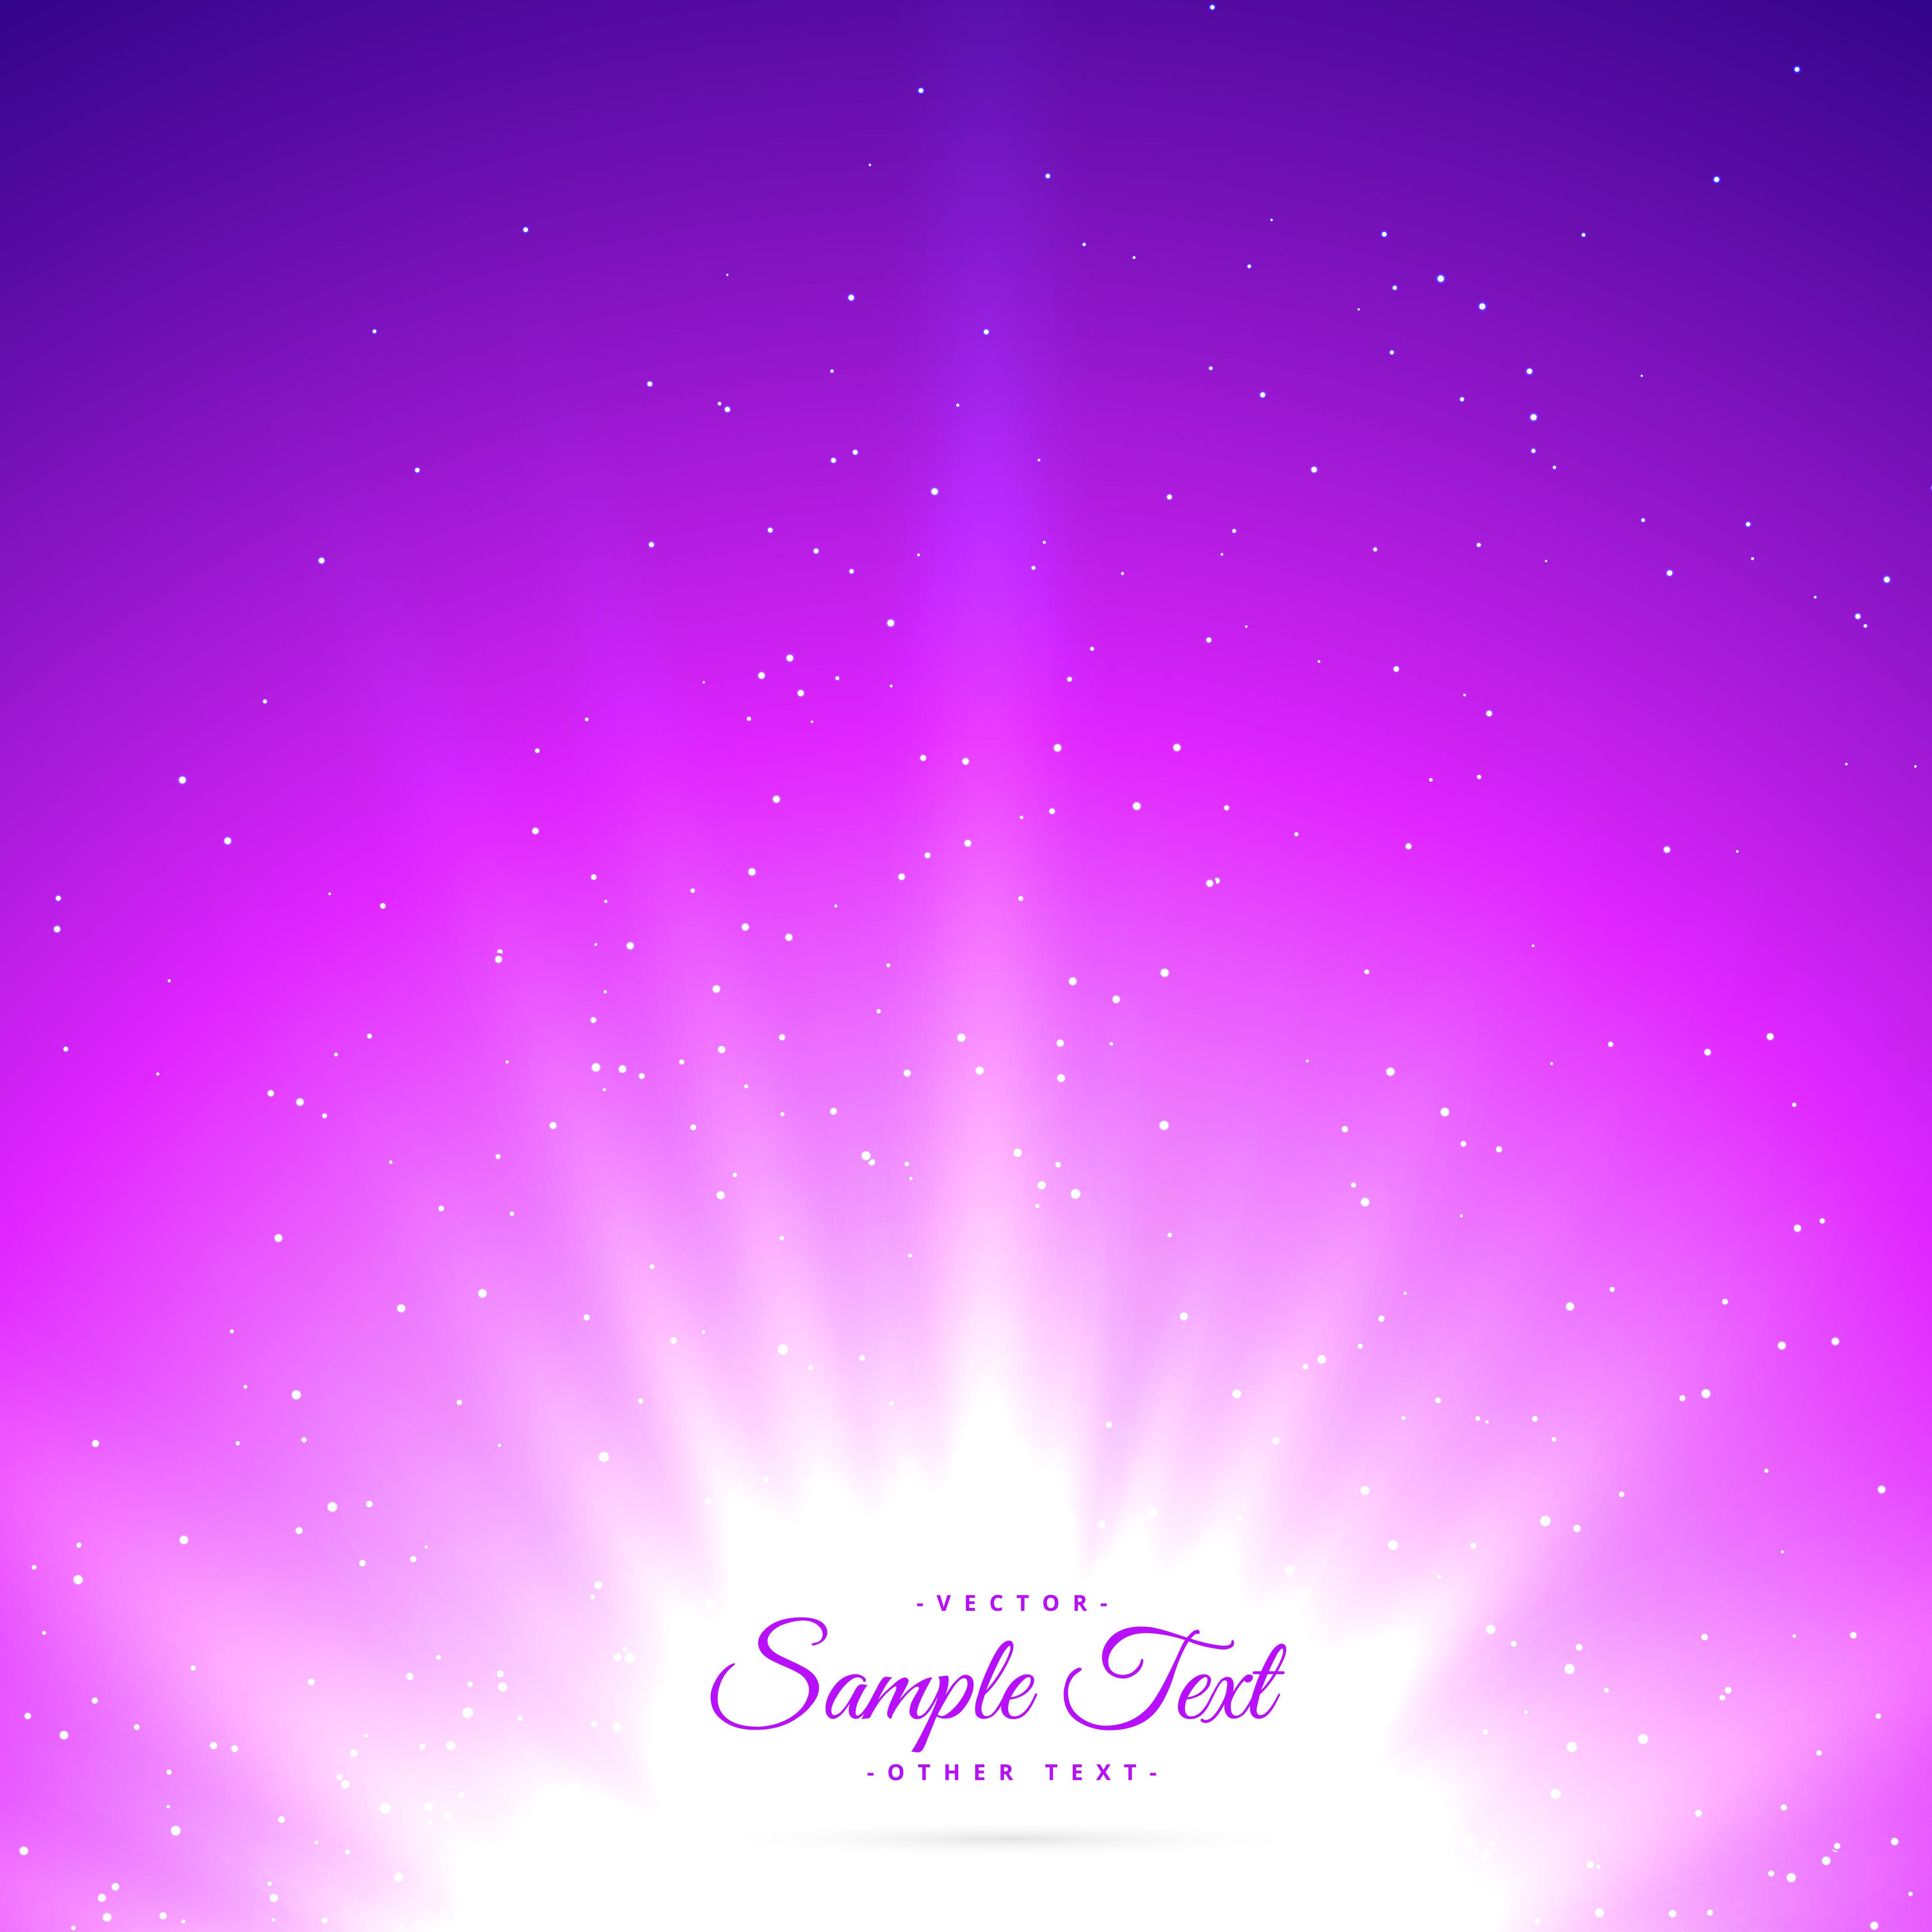 purple sunburst shiny glowing background download free